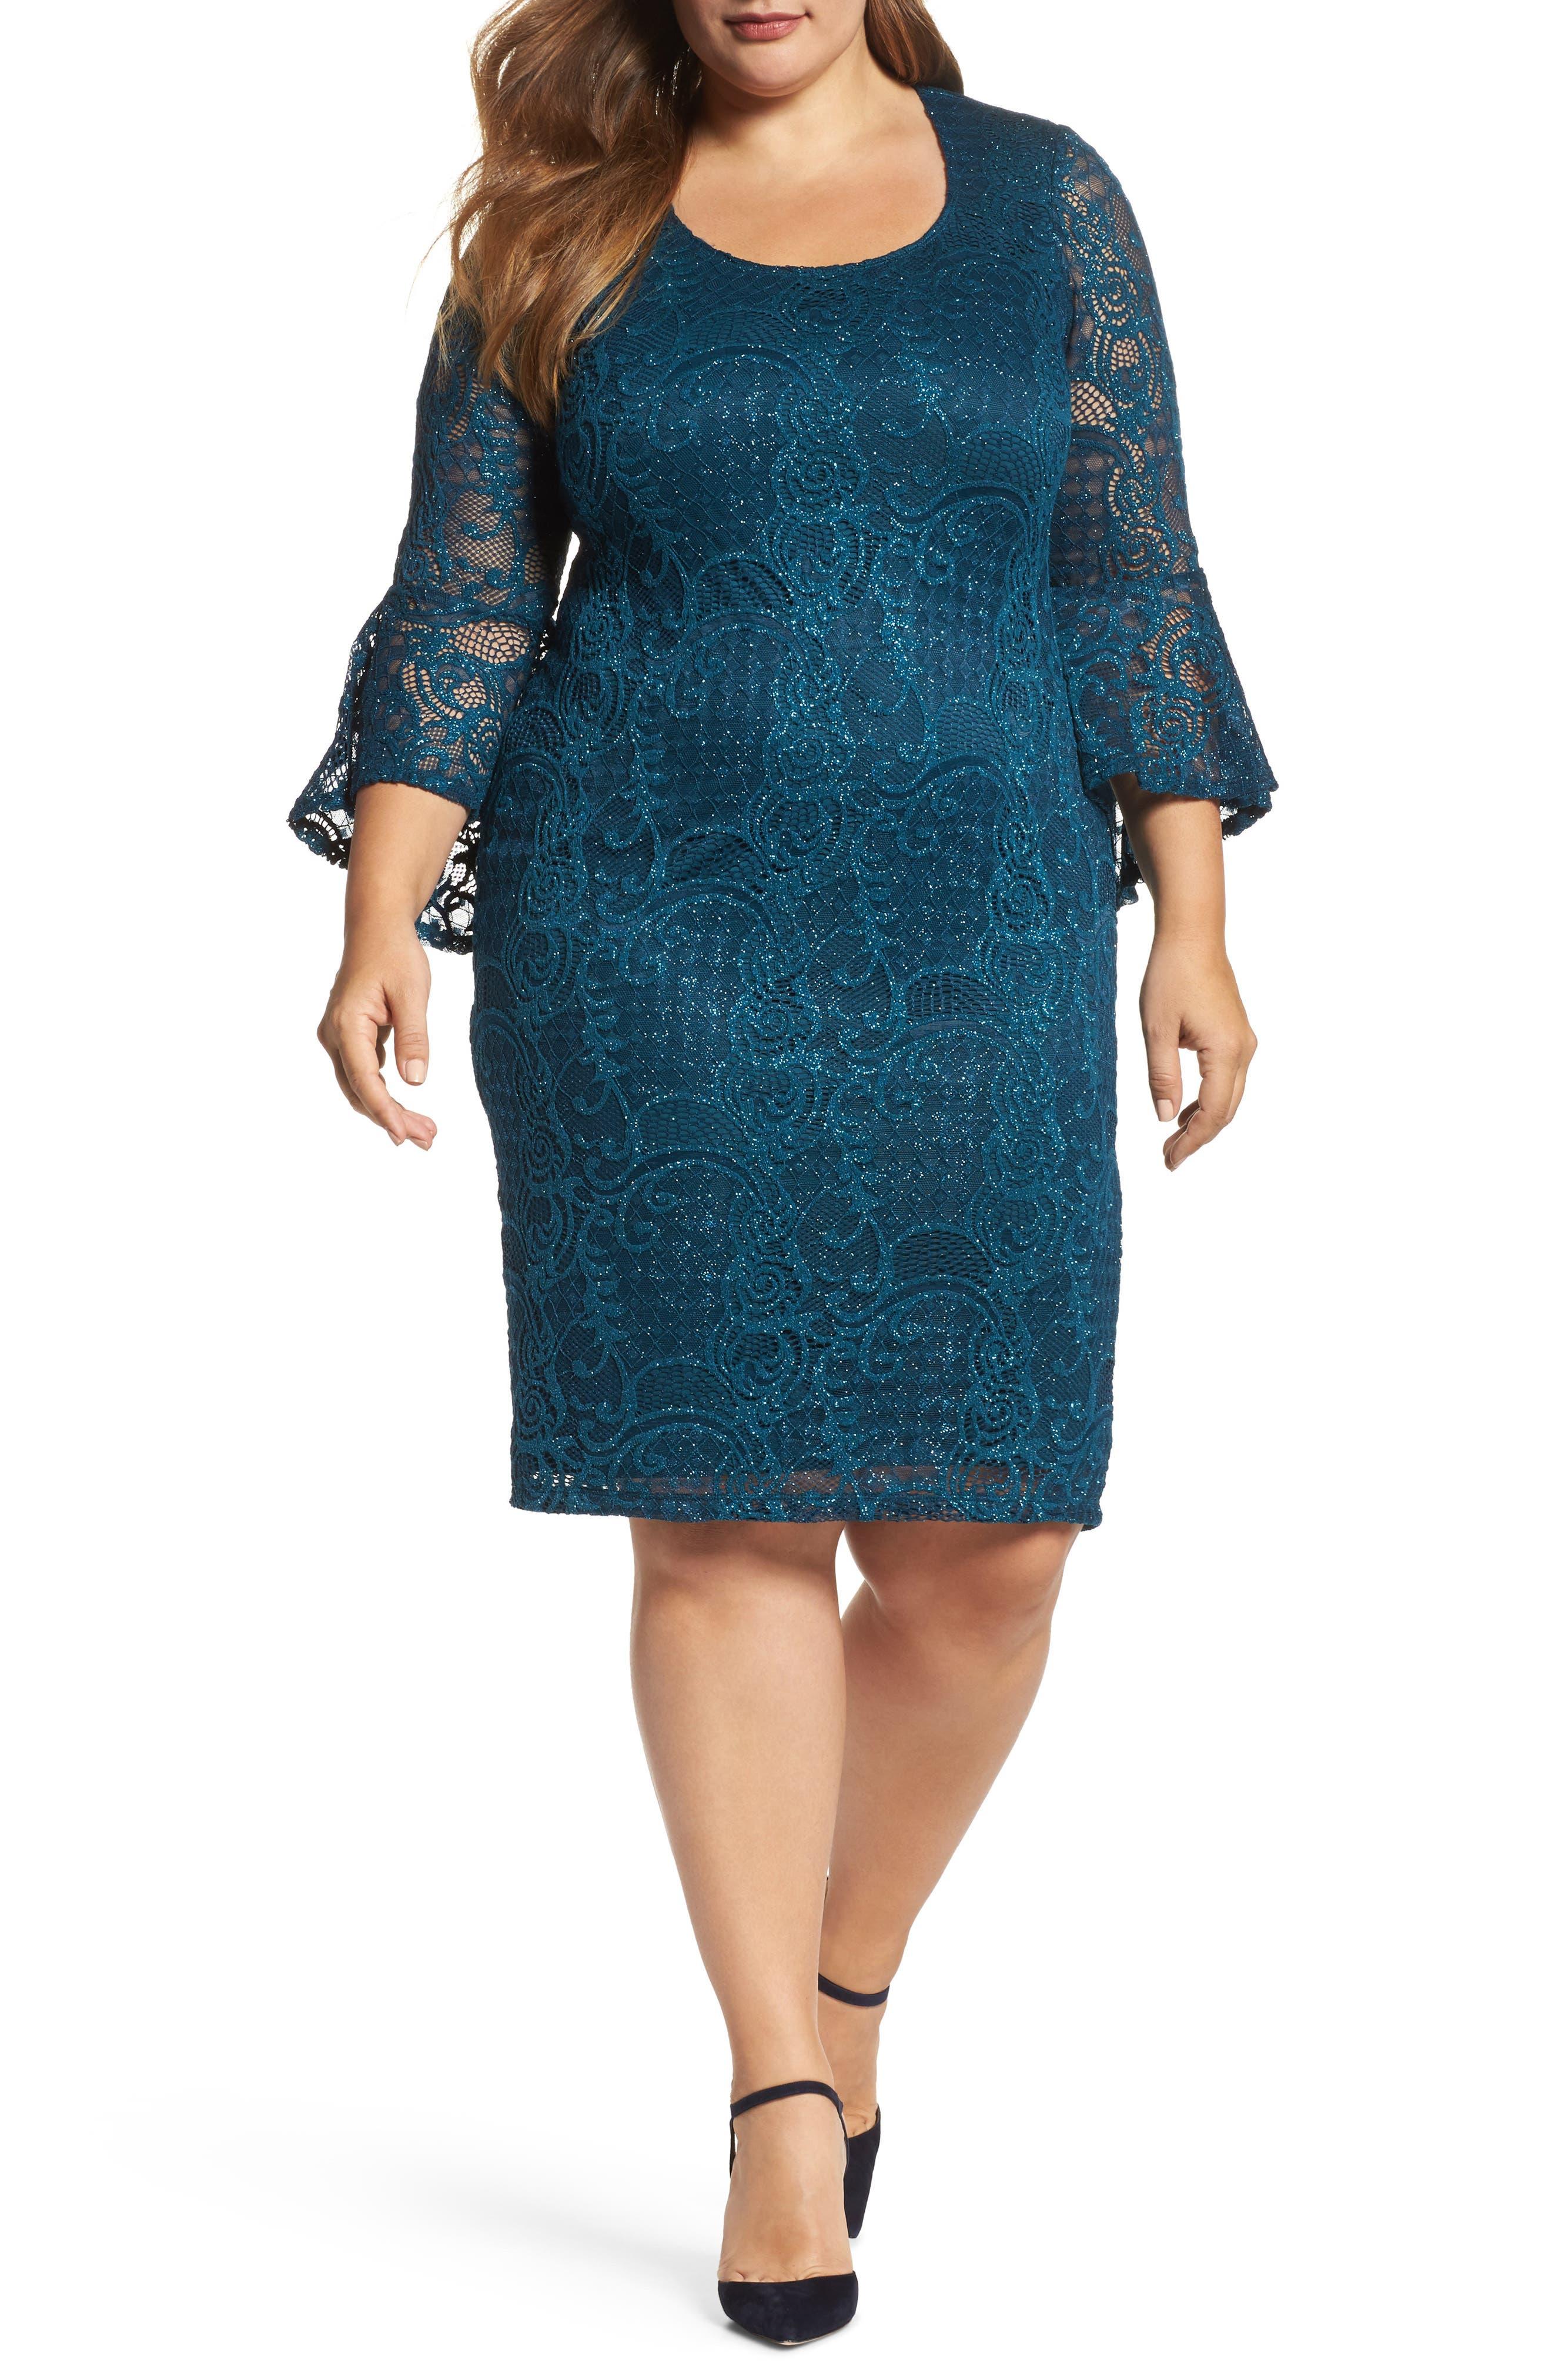 Bell Sleeve Glitter Lace Sheath Dress,                             Main thumbnail 1, color,                             412